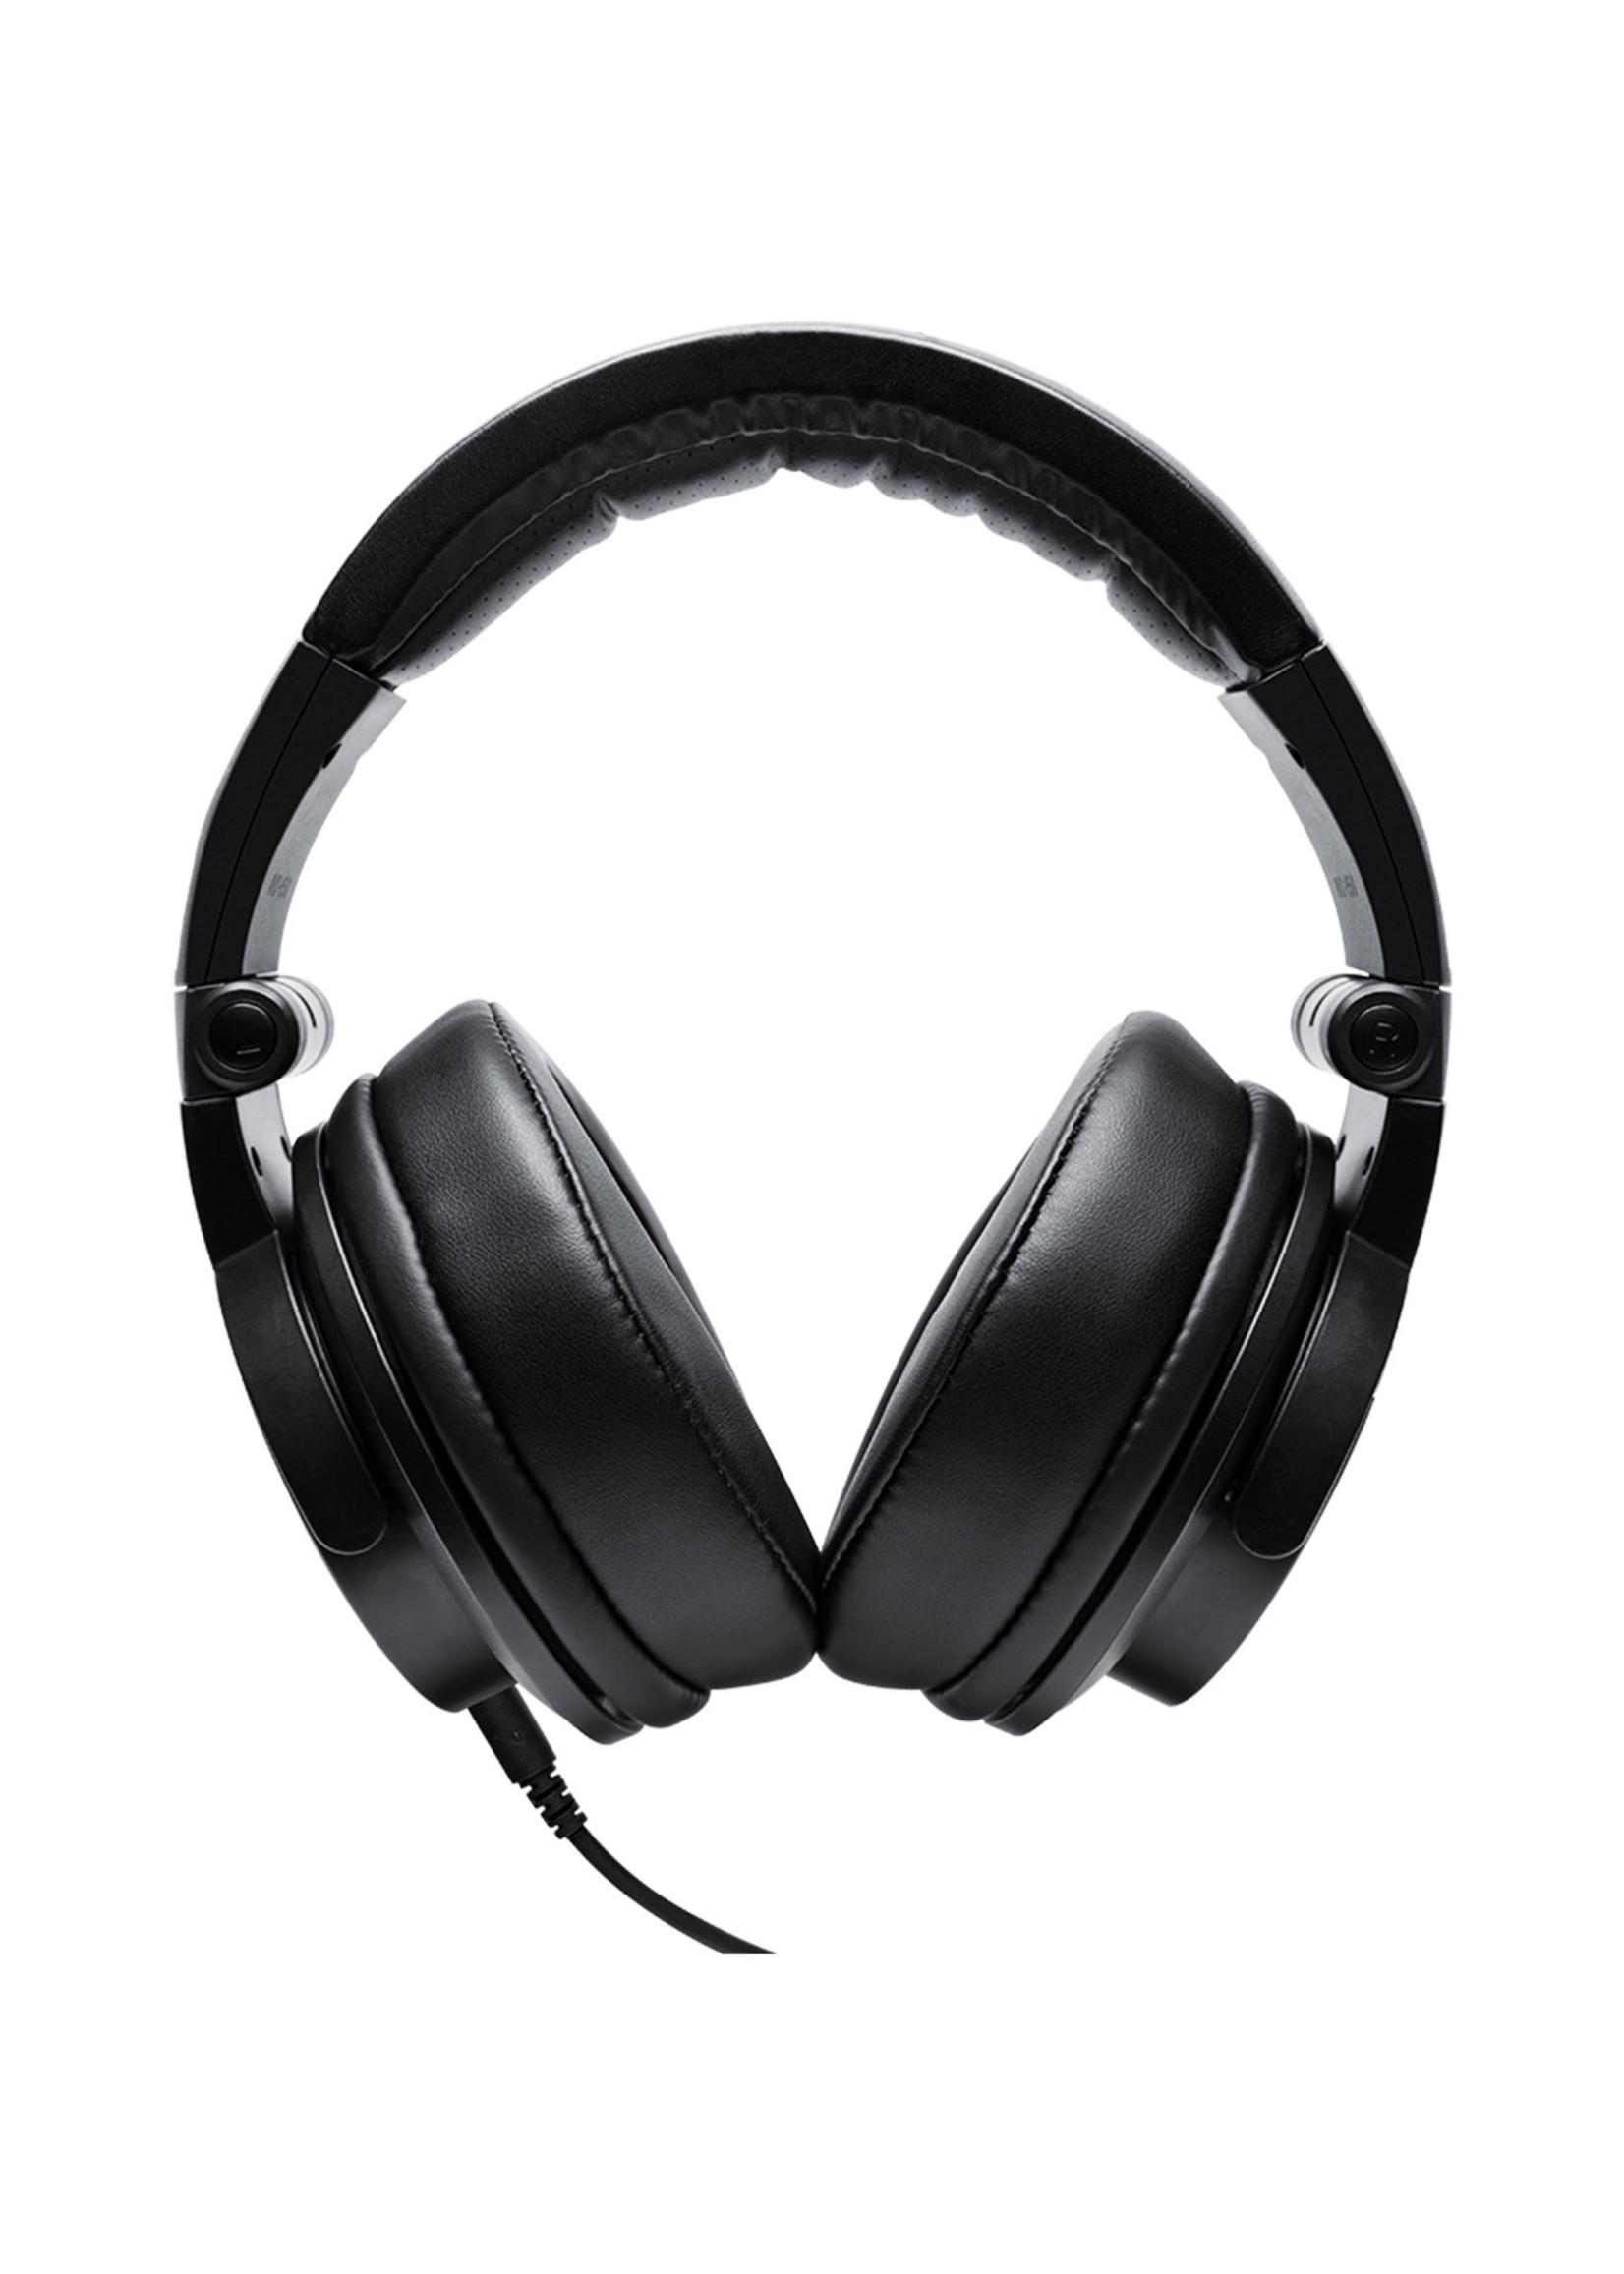 Mackie MC-150 Studio Headphones